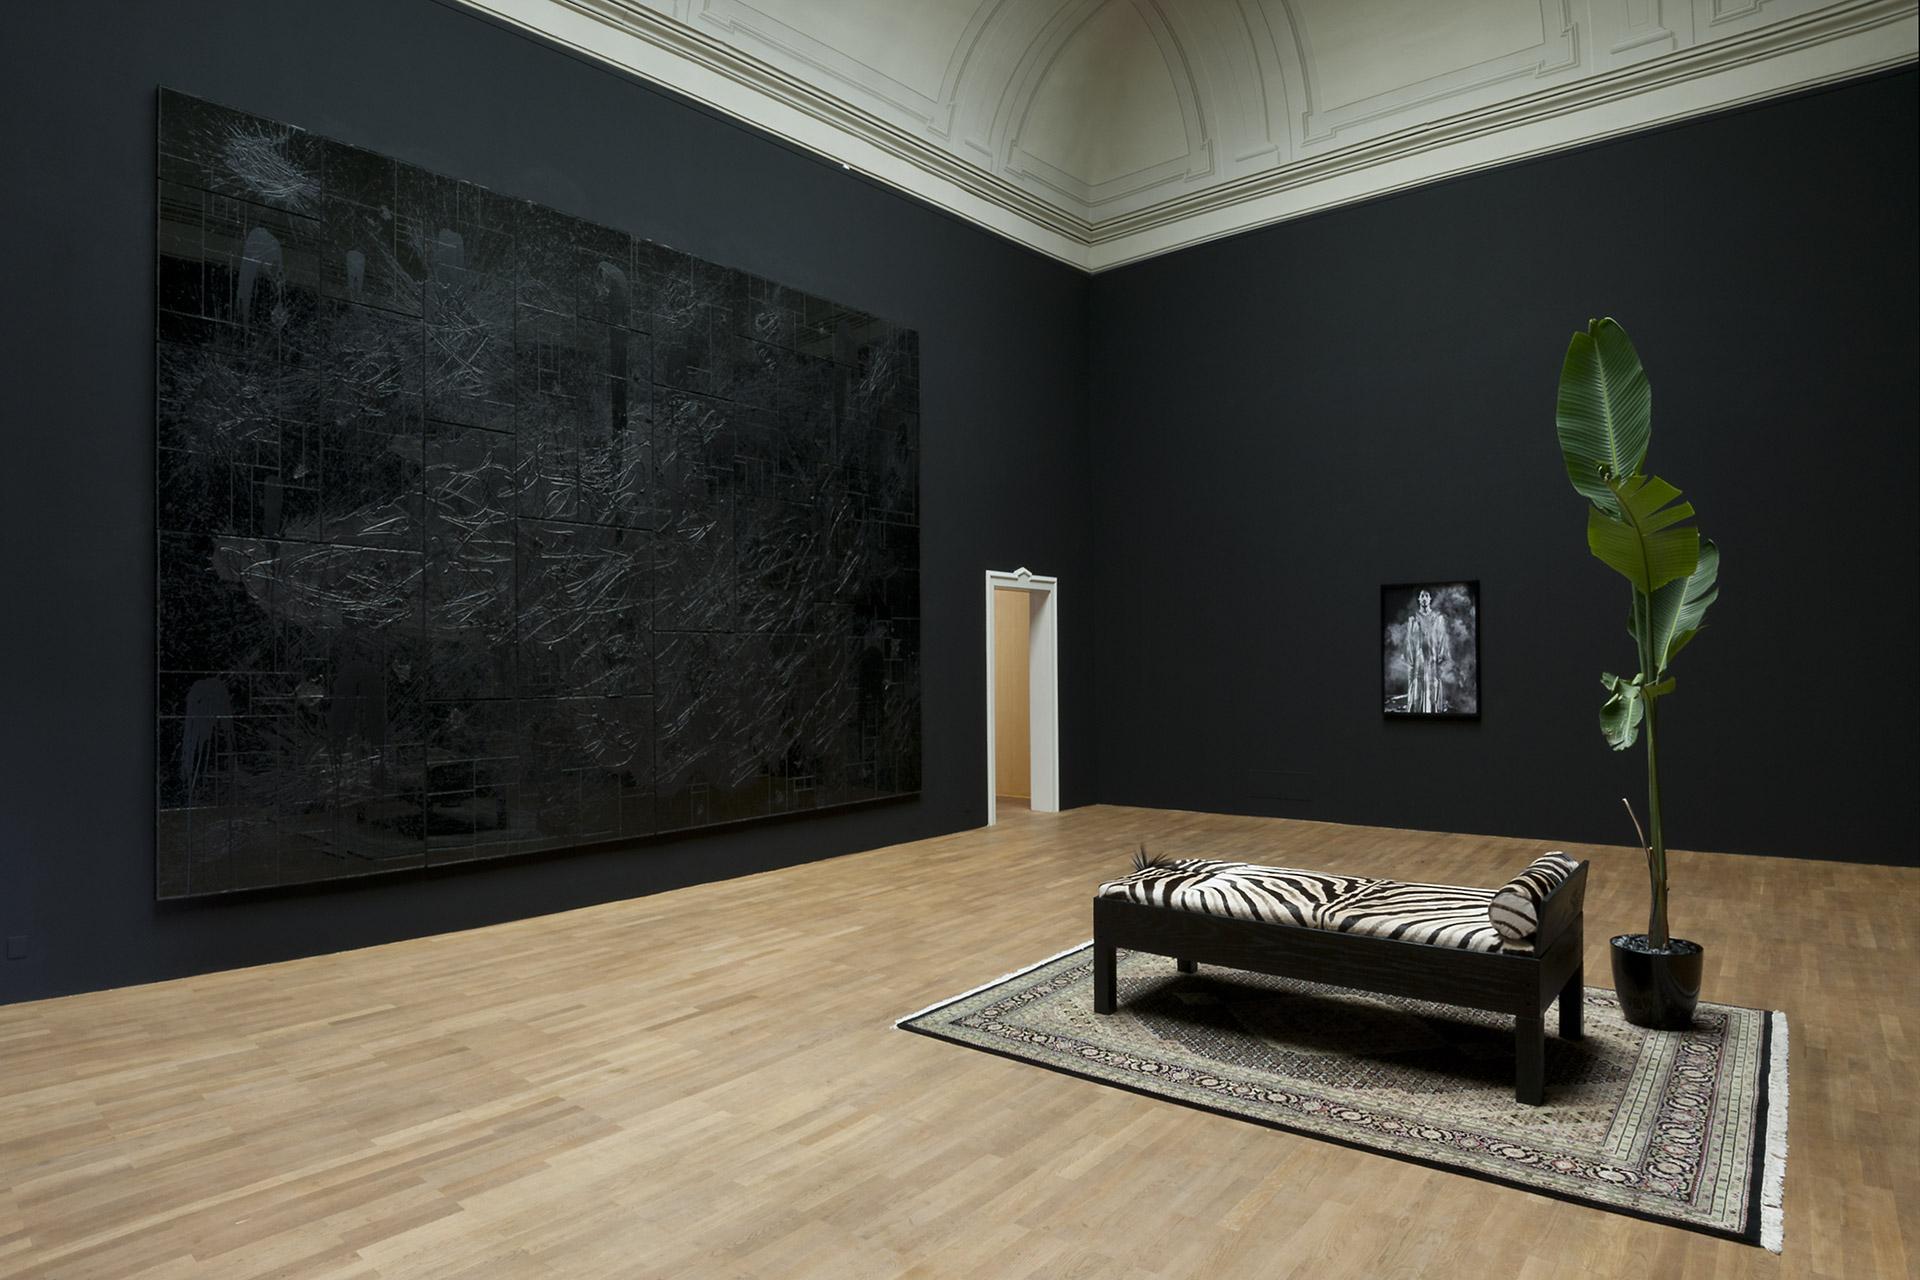 Rashid-Johnson-Kunsthalle-Winterthur-2014-1.jpg